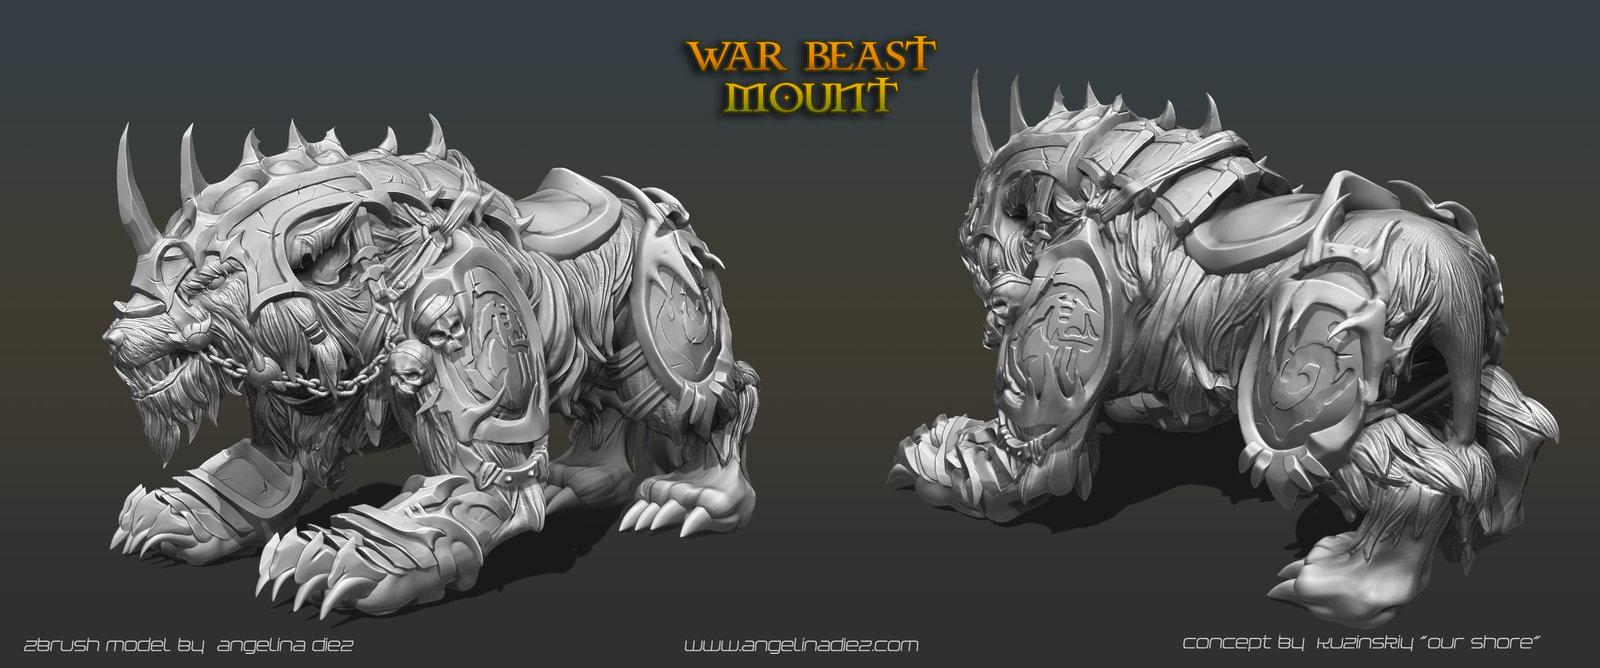 Warbeast Mount